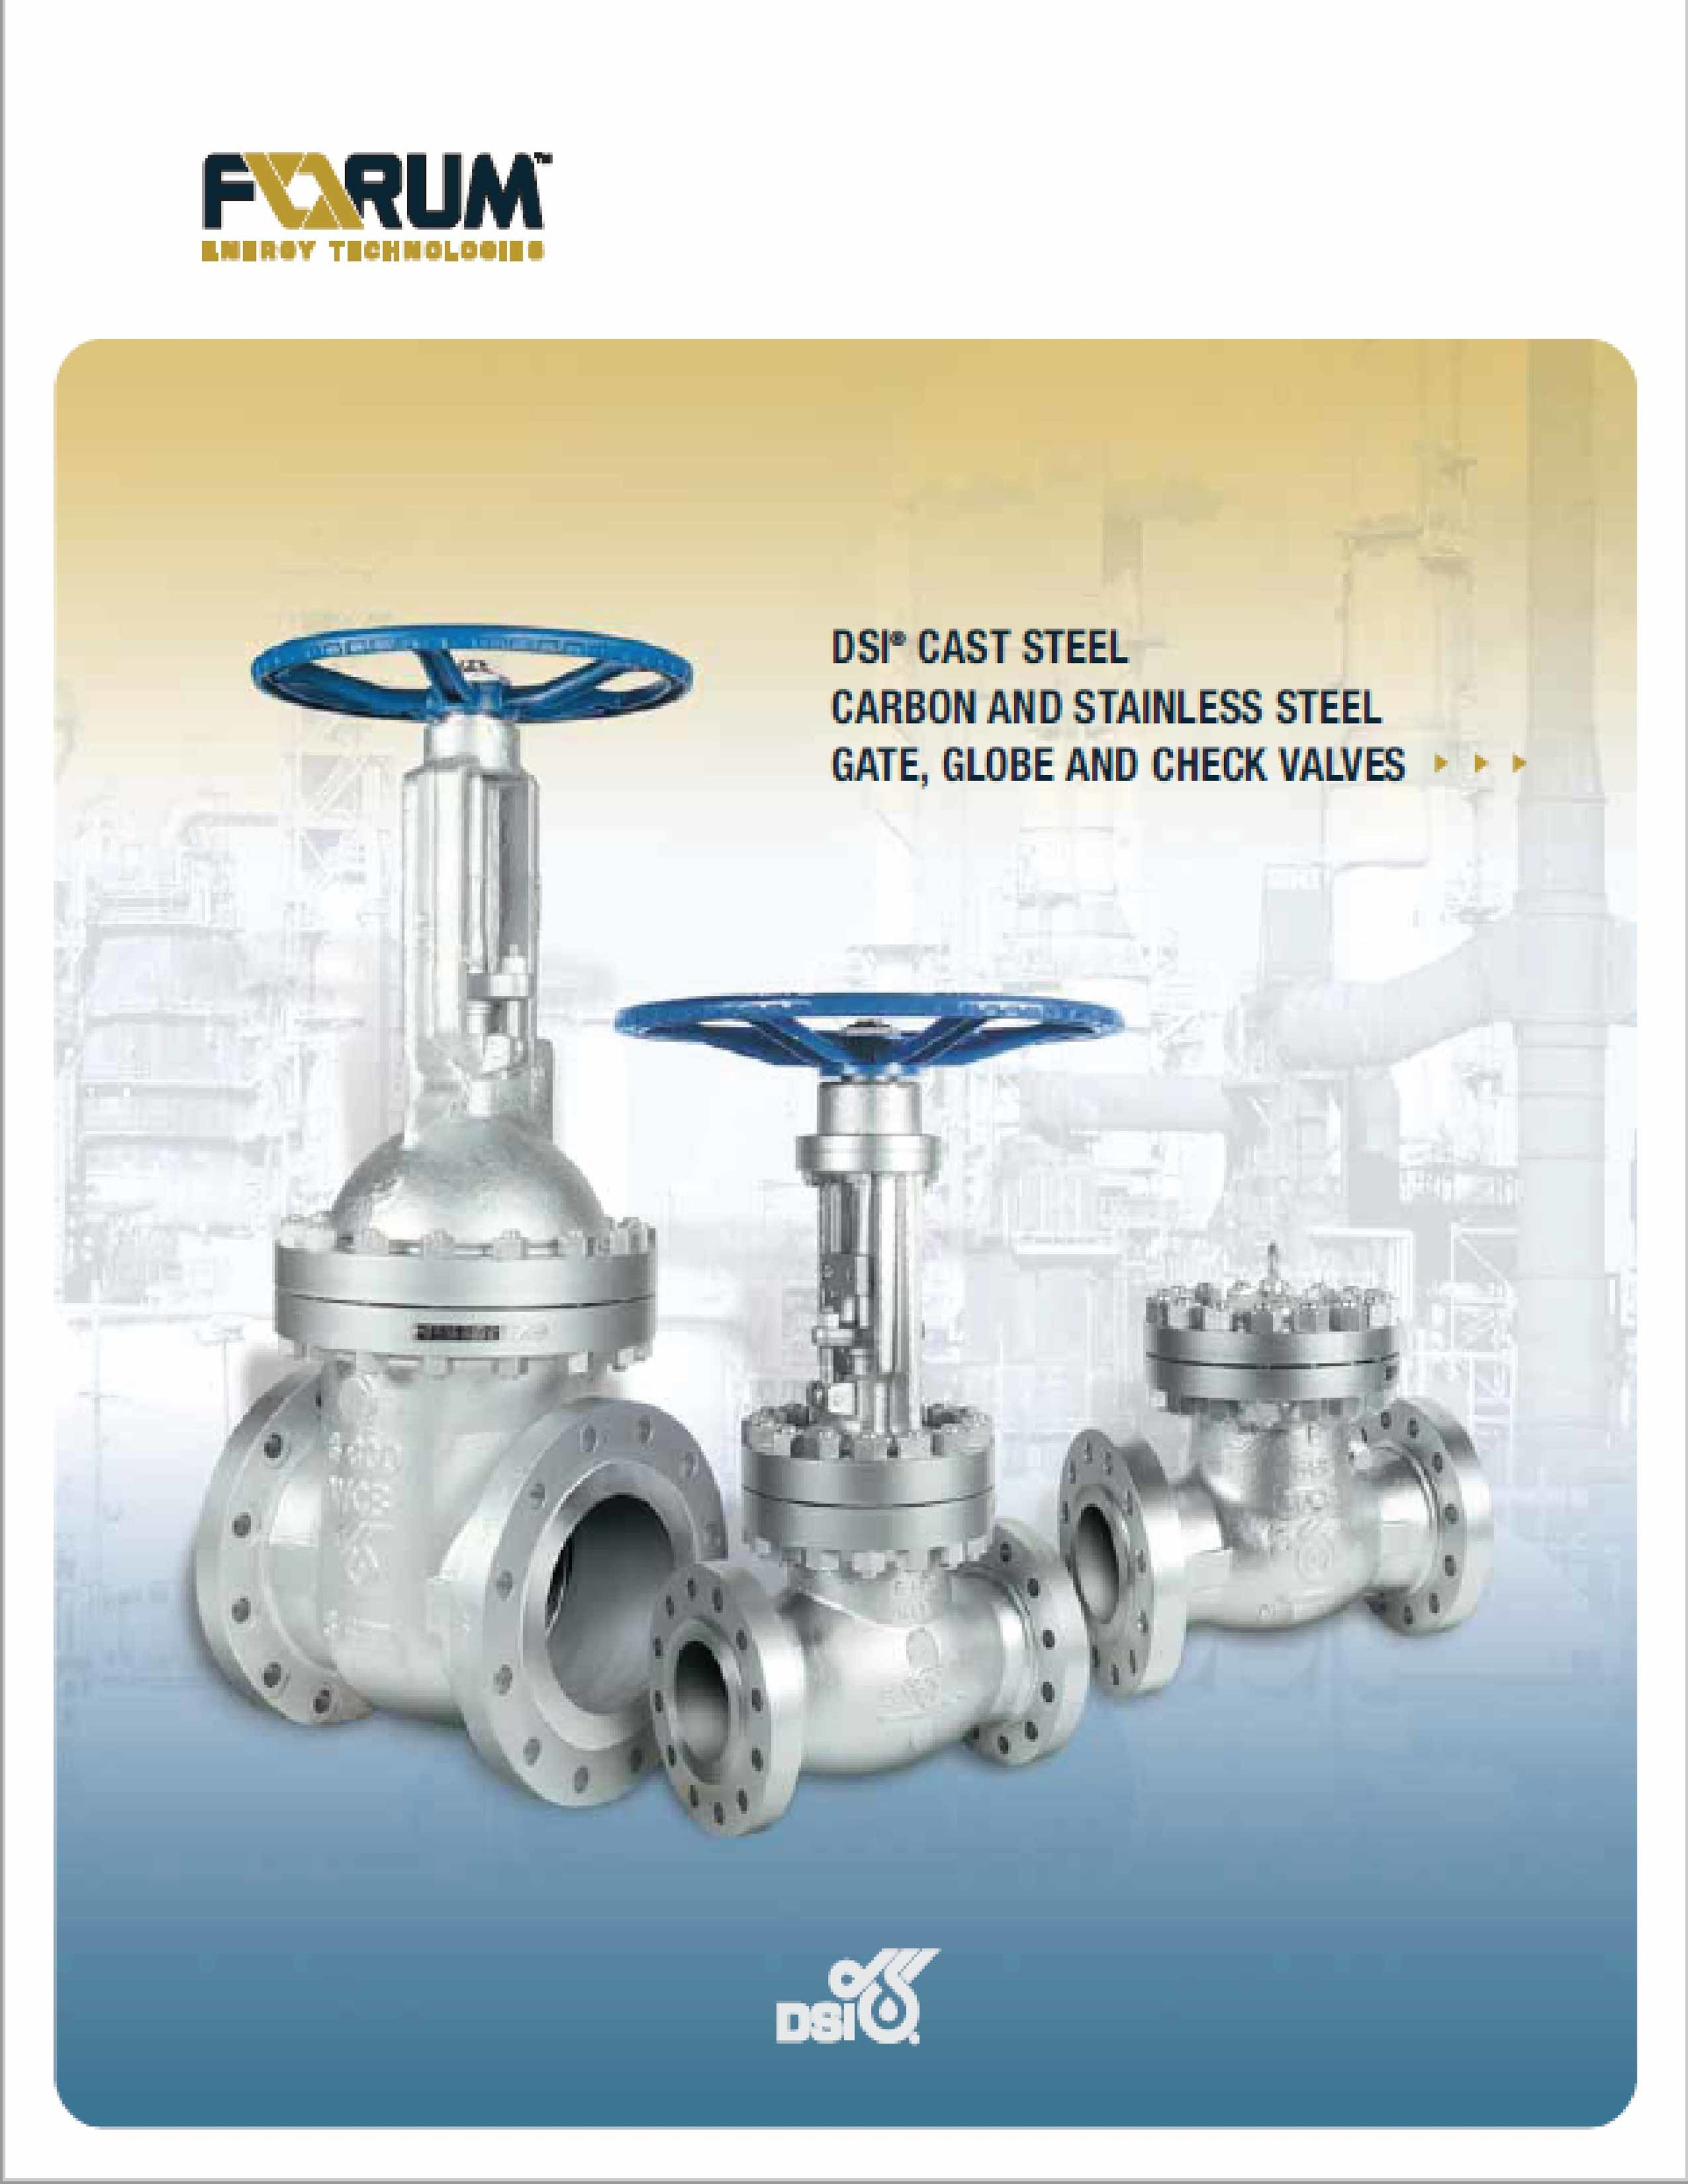 DSI_api600-brochure-01.jpg